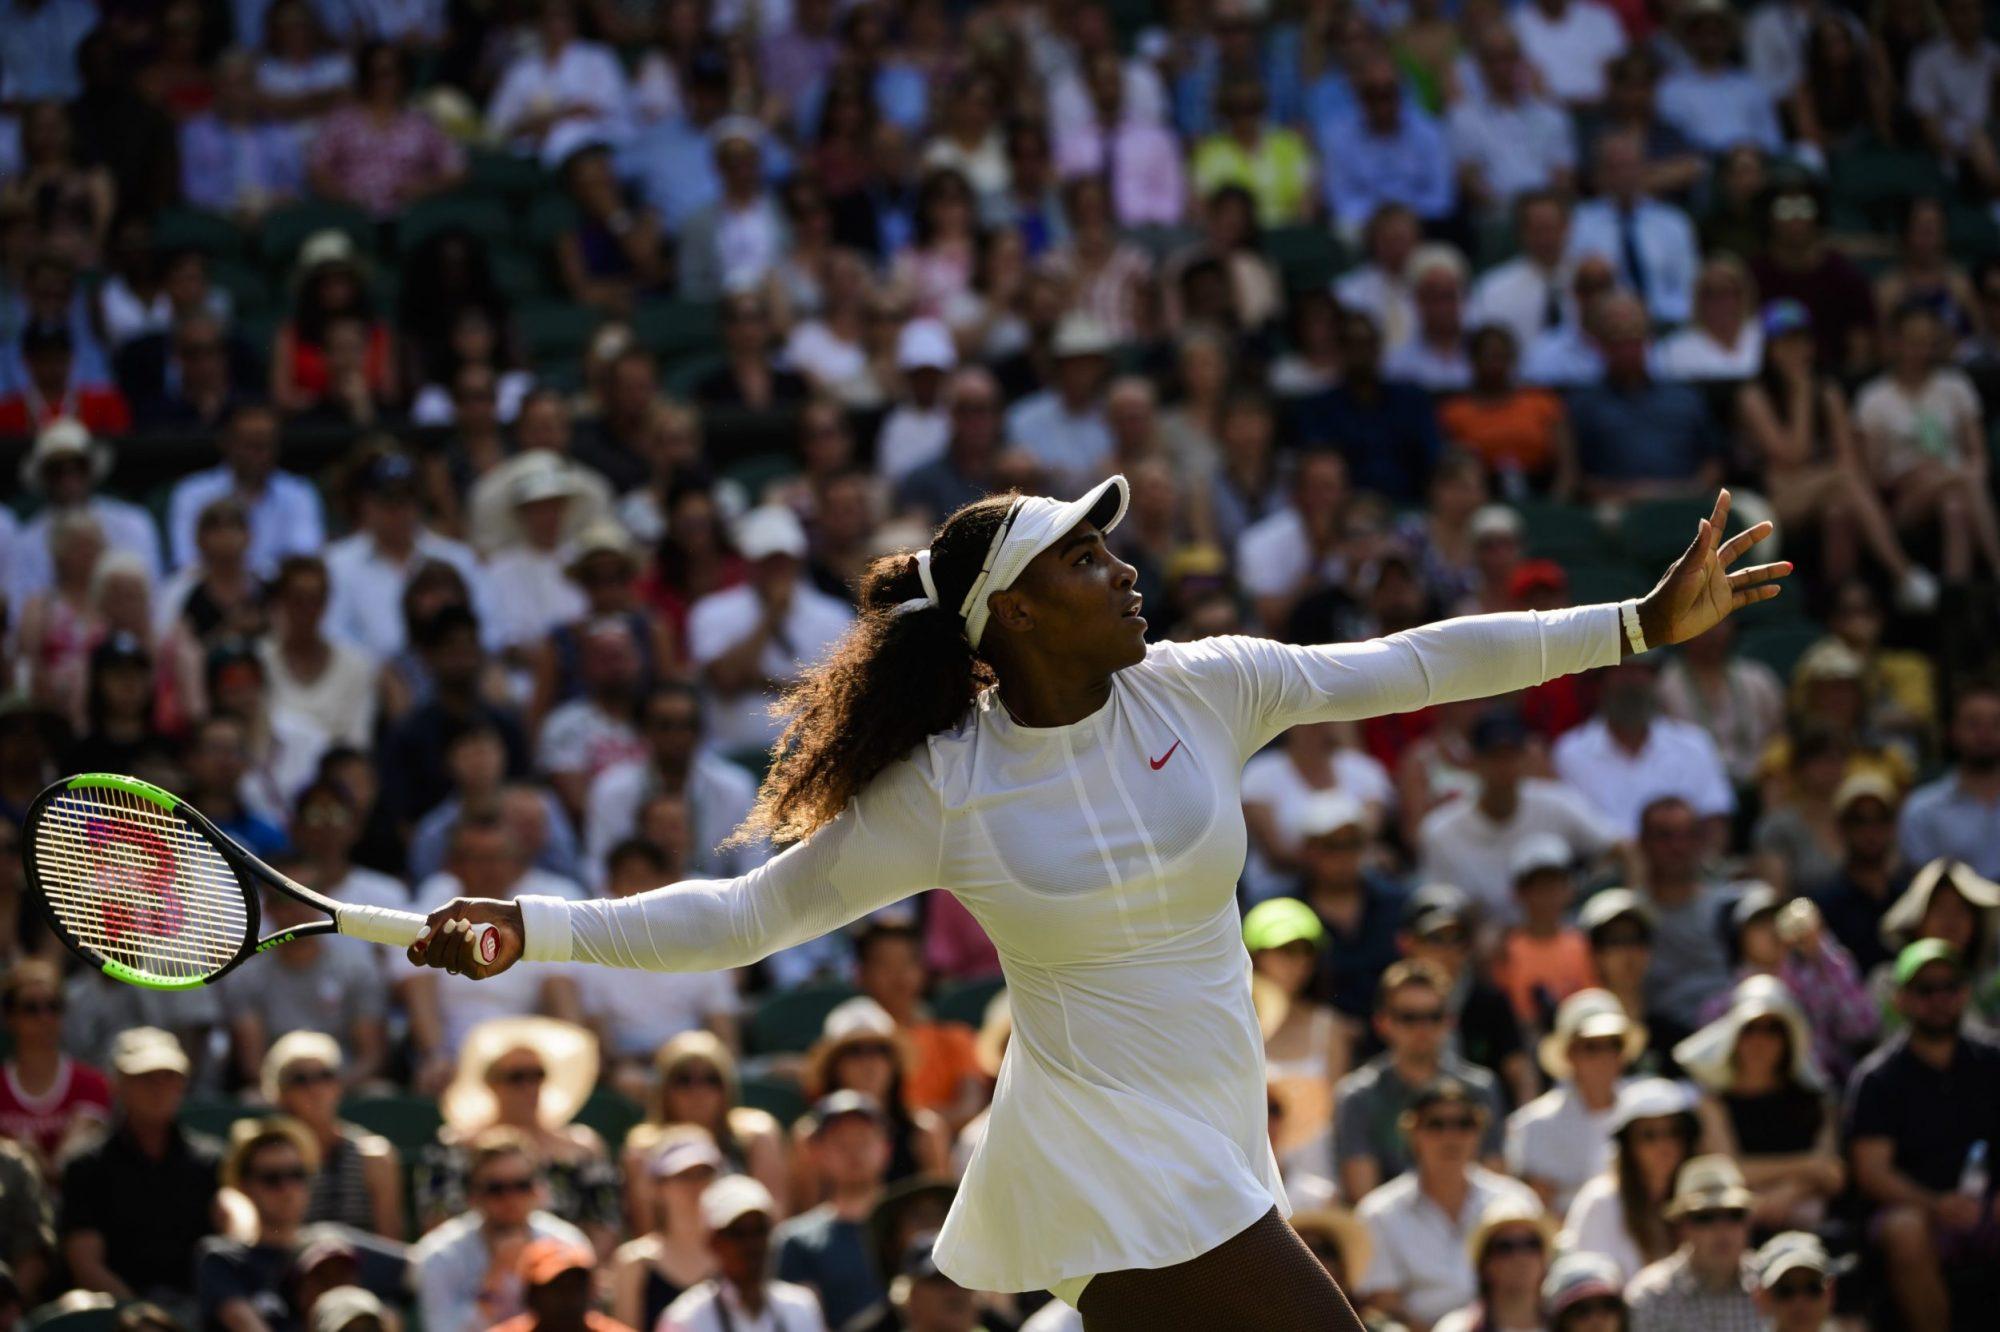 Photo of Serena Williams at Wimbledon 2018